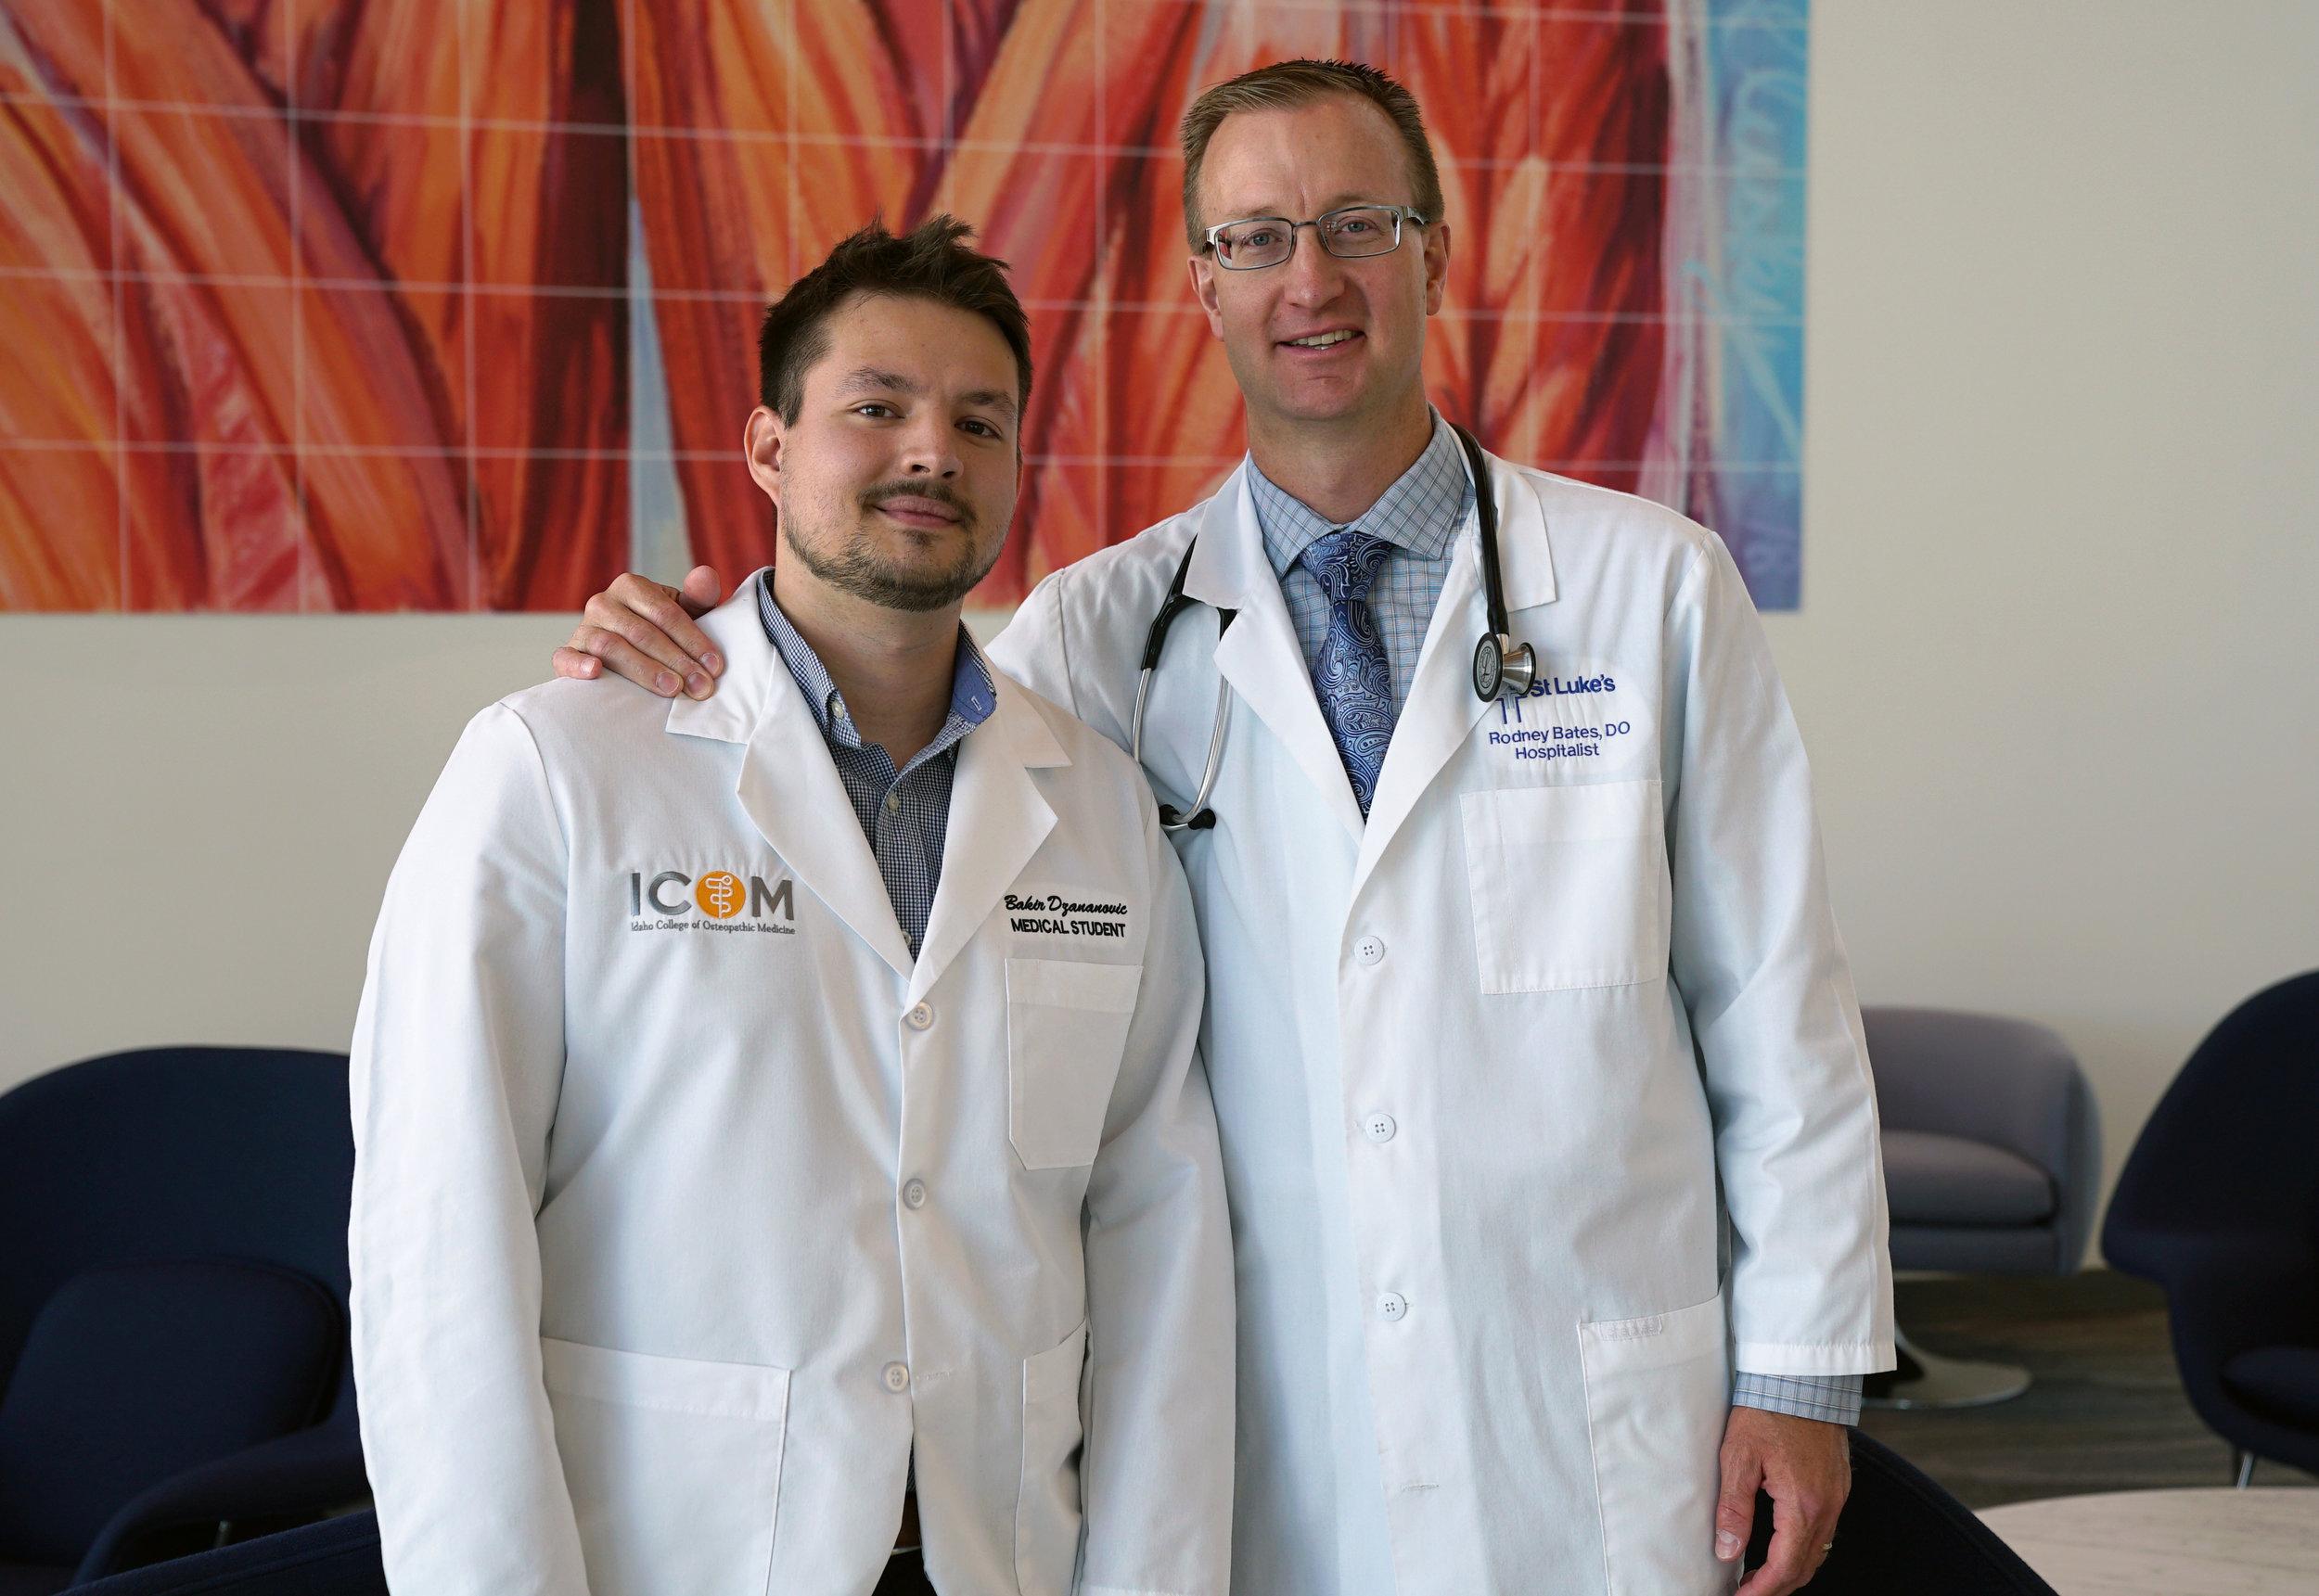 (L-R) Student Doctor Bakir Dzananovic and Dr. Rodney Bates.